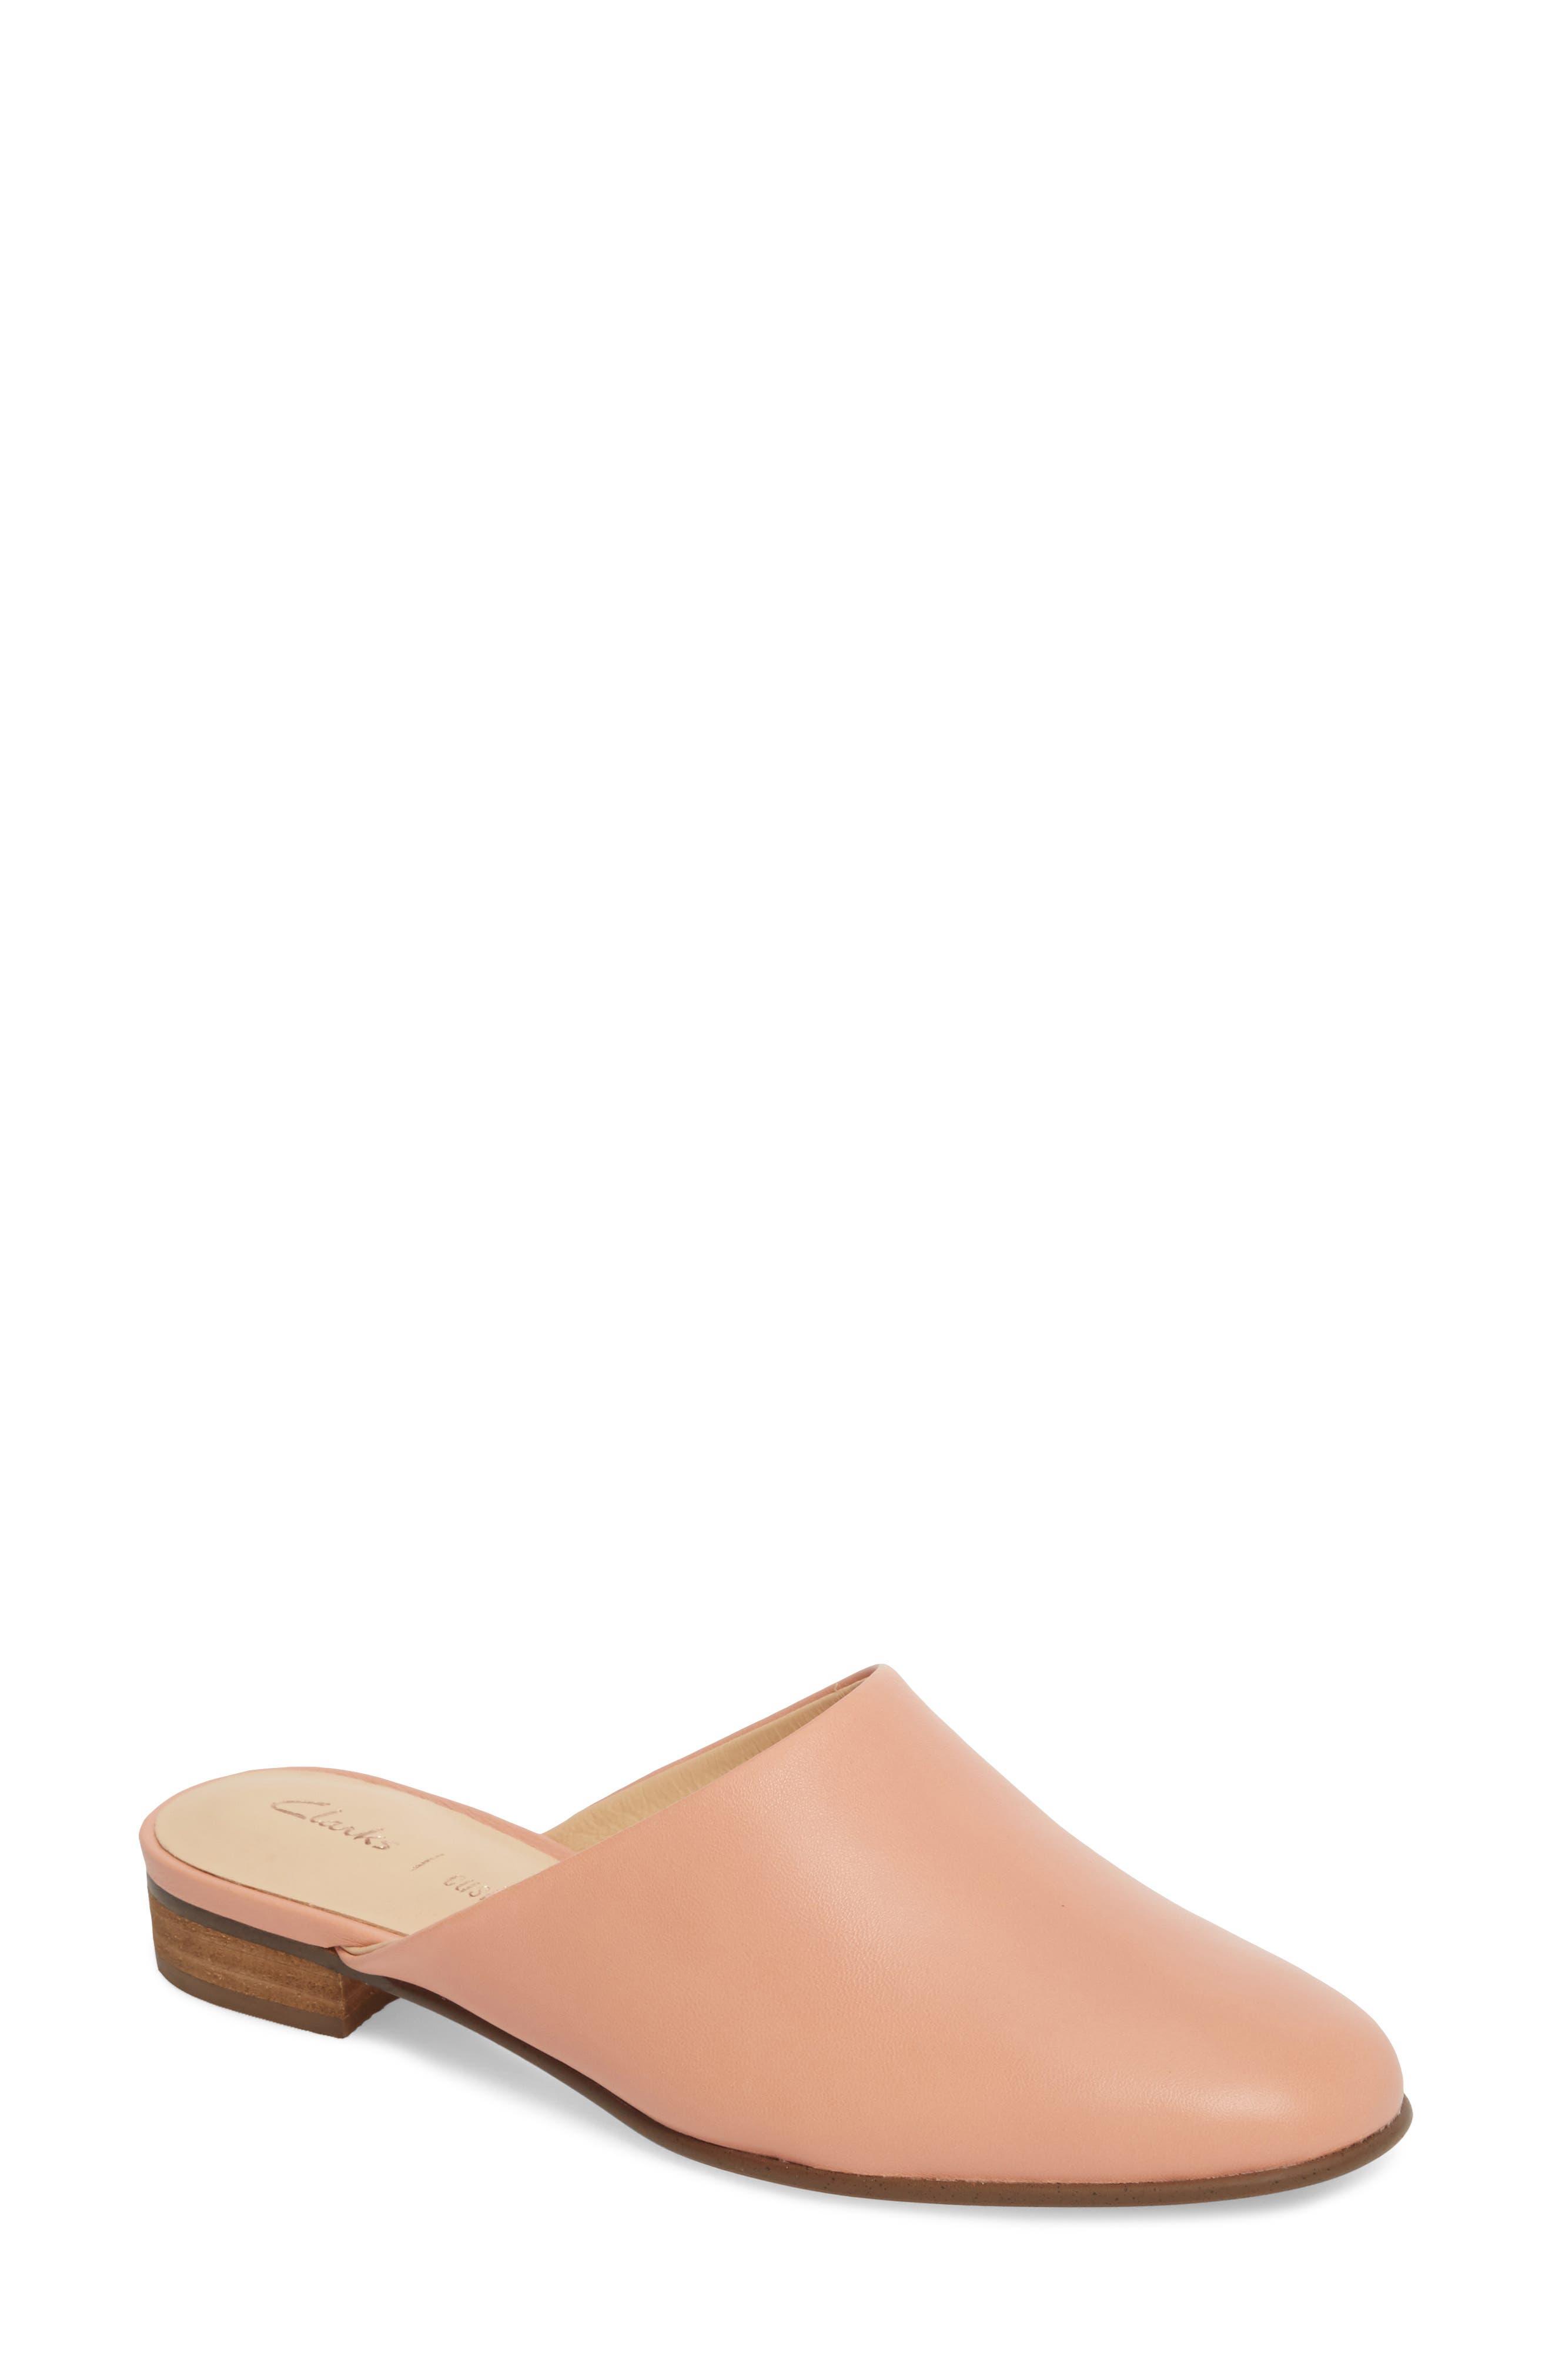 Clarks® Pure Blush Mule (Women)